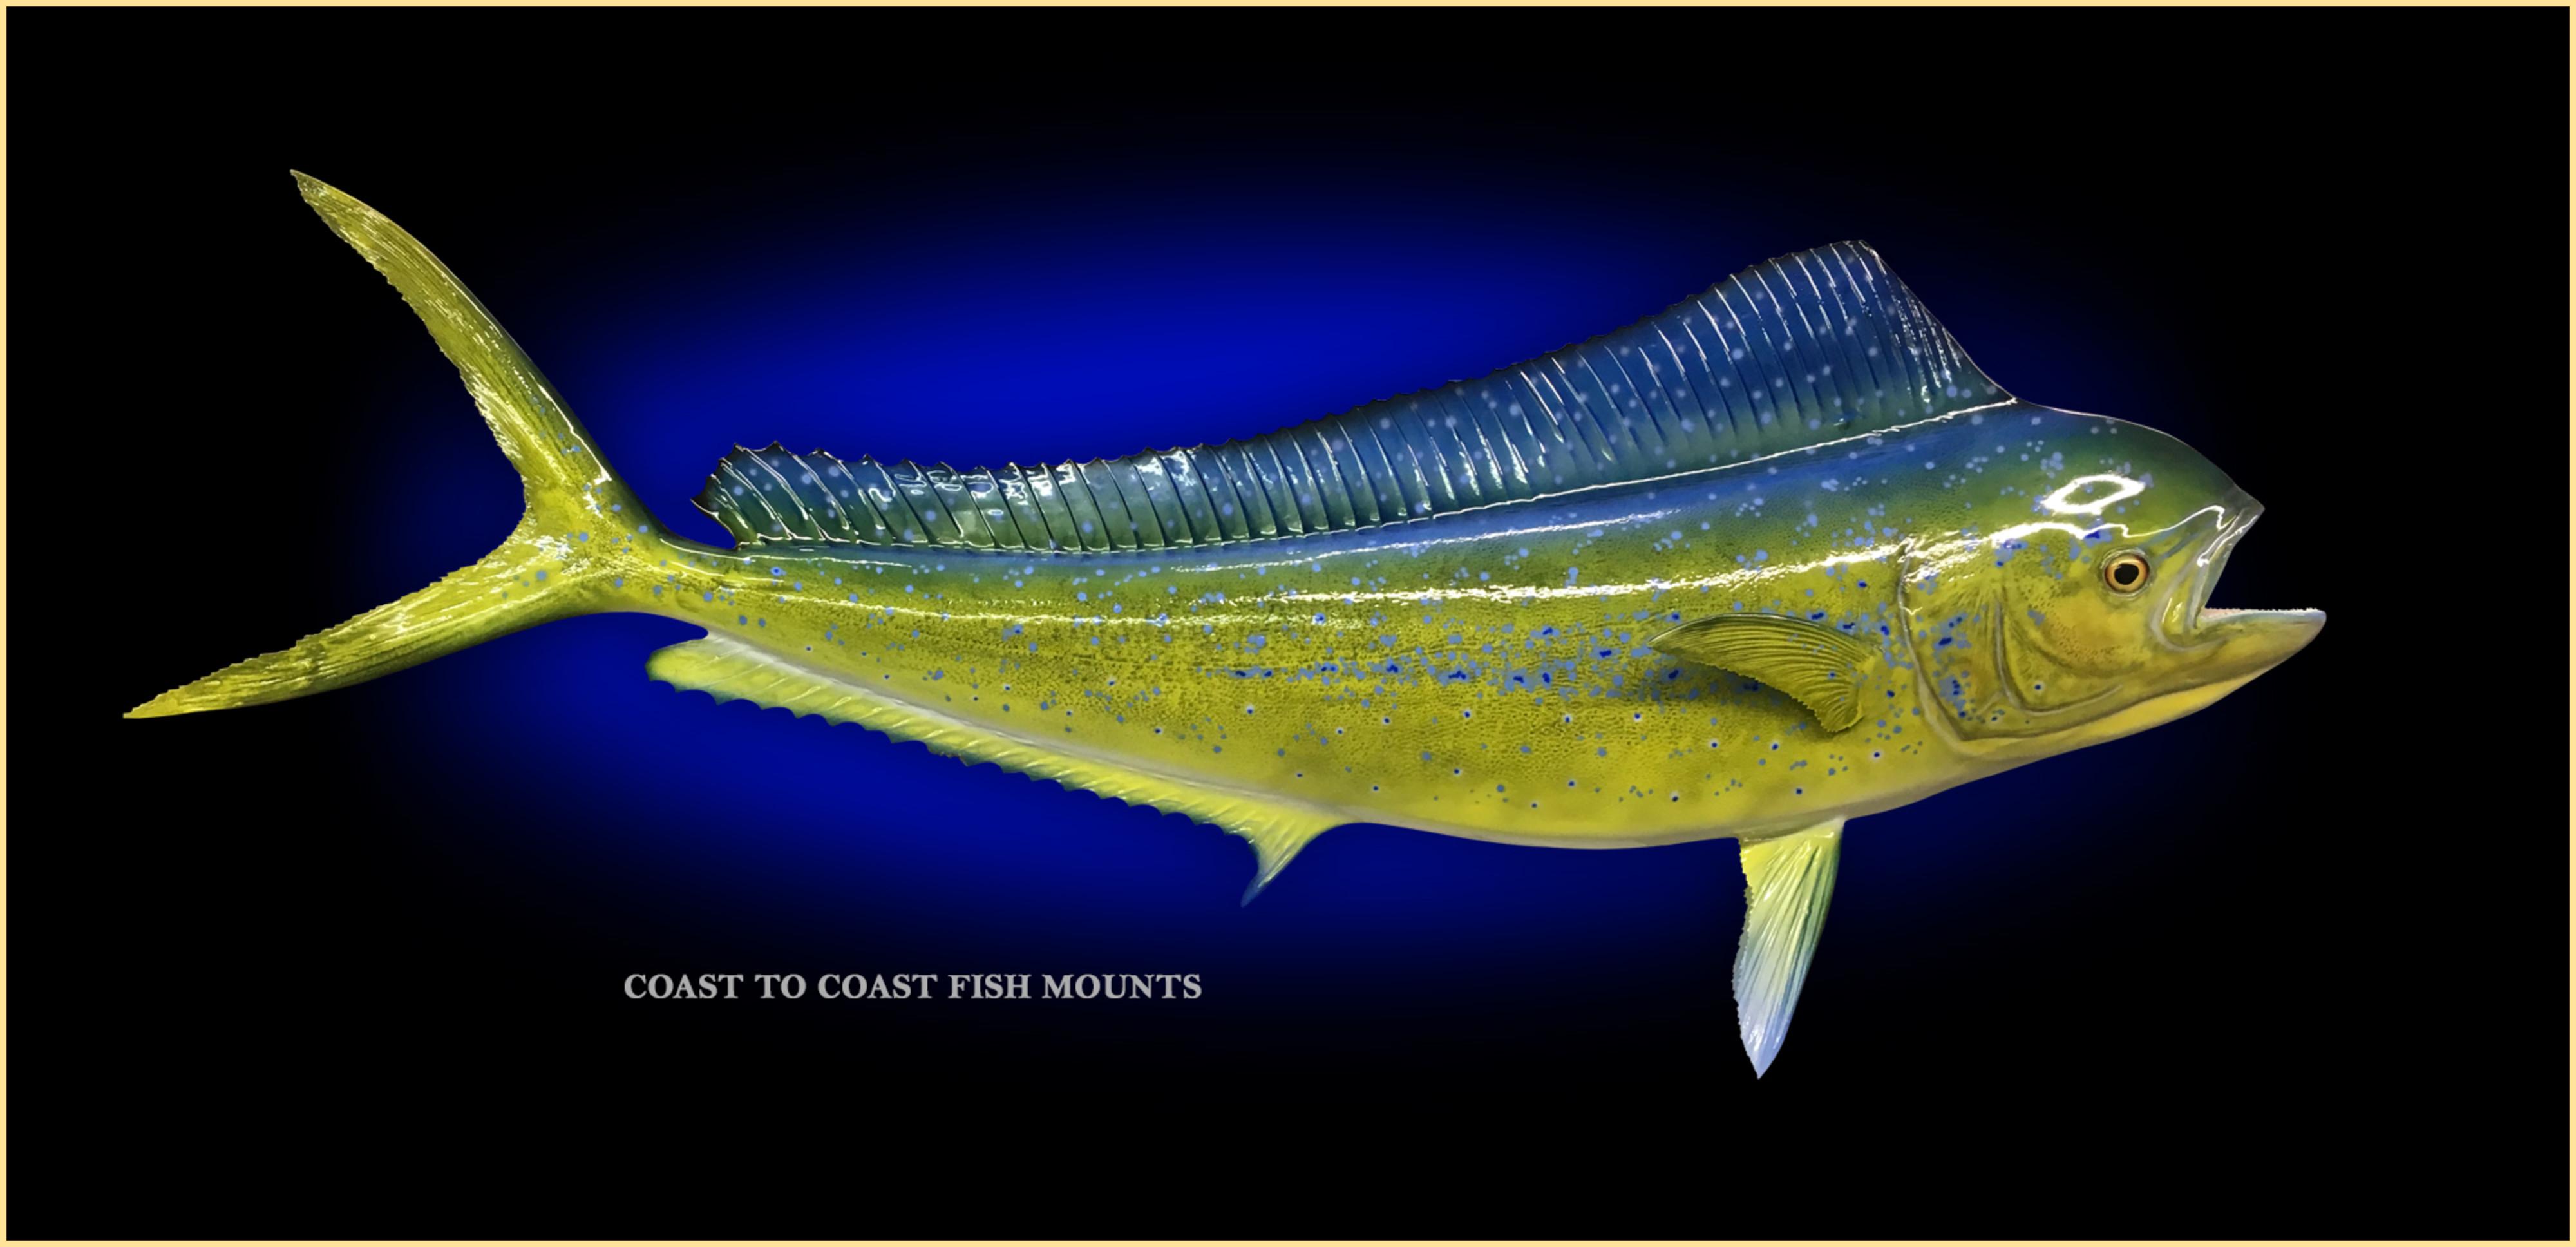 Dolphin (Mahi) Fish Mount and Fish Replicas | Coast-to-Coast